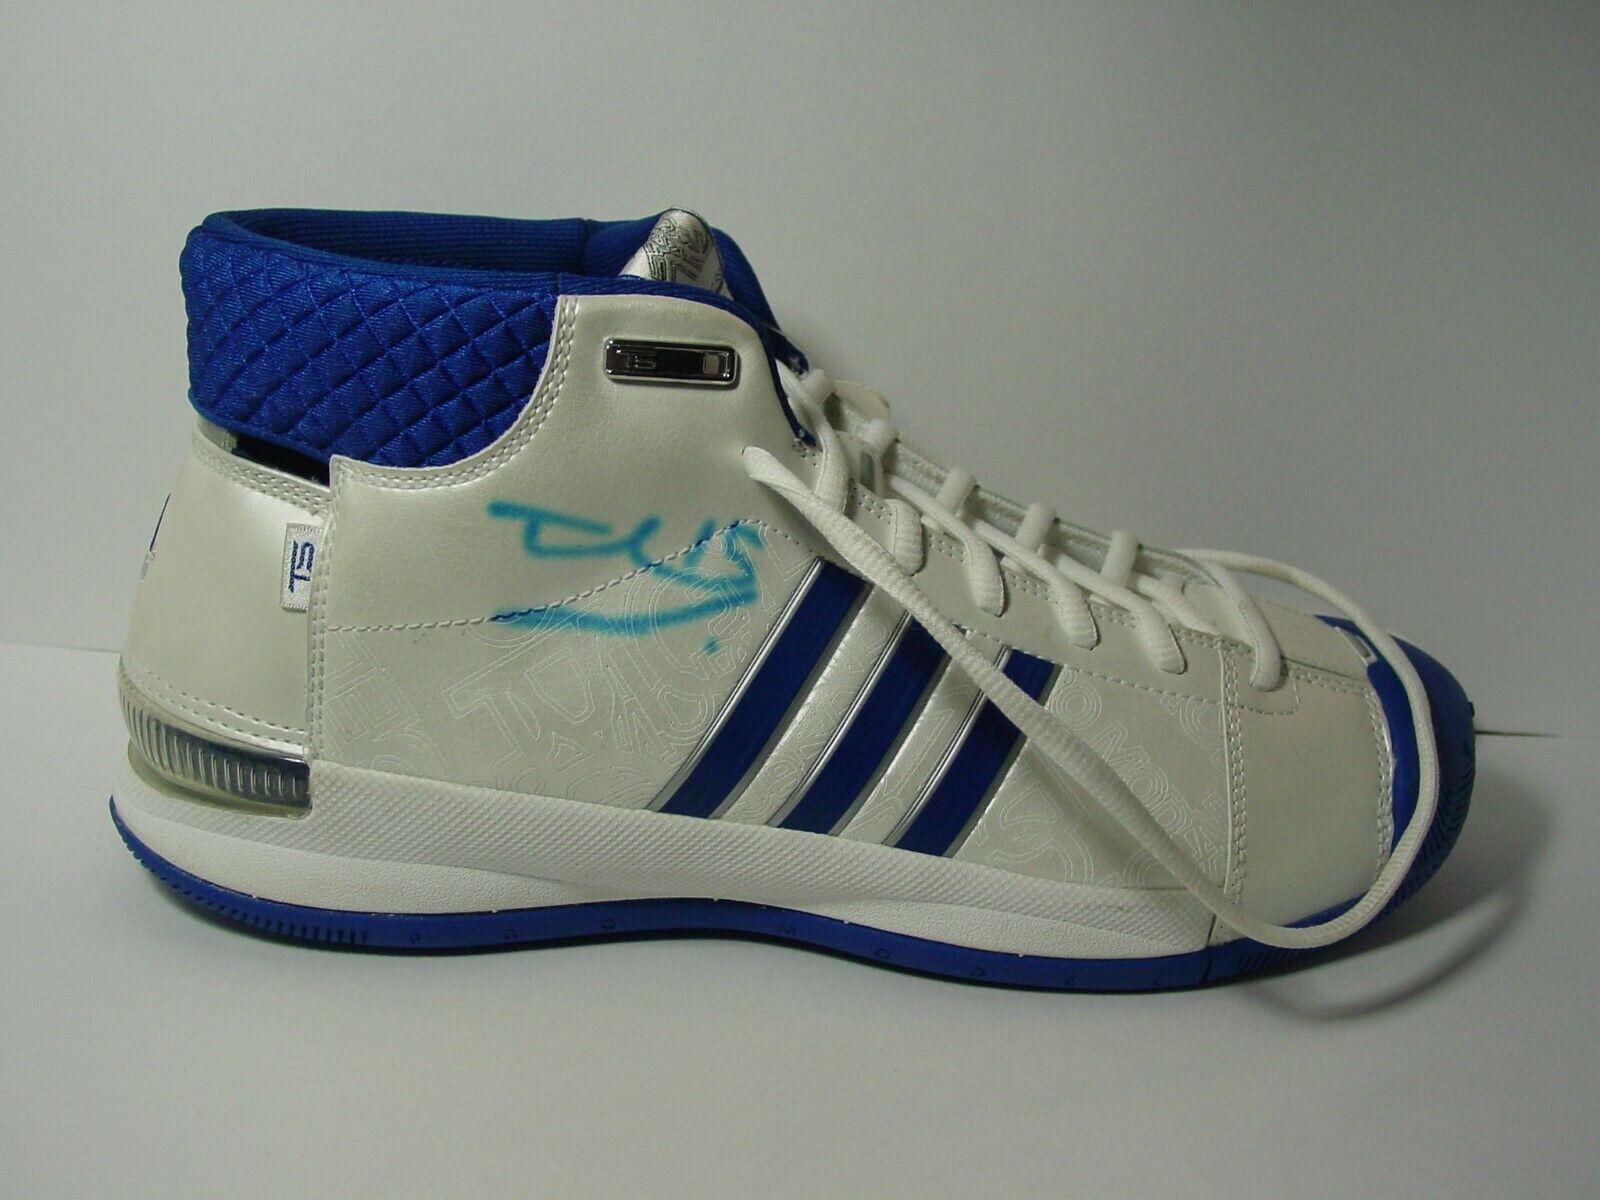 Adidas AST TS PRO MODEL Basketball shoes White w  bluee  SIZE 10